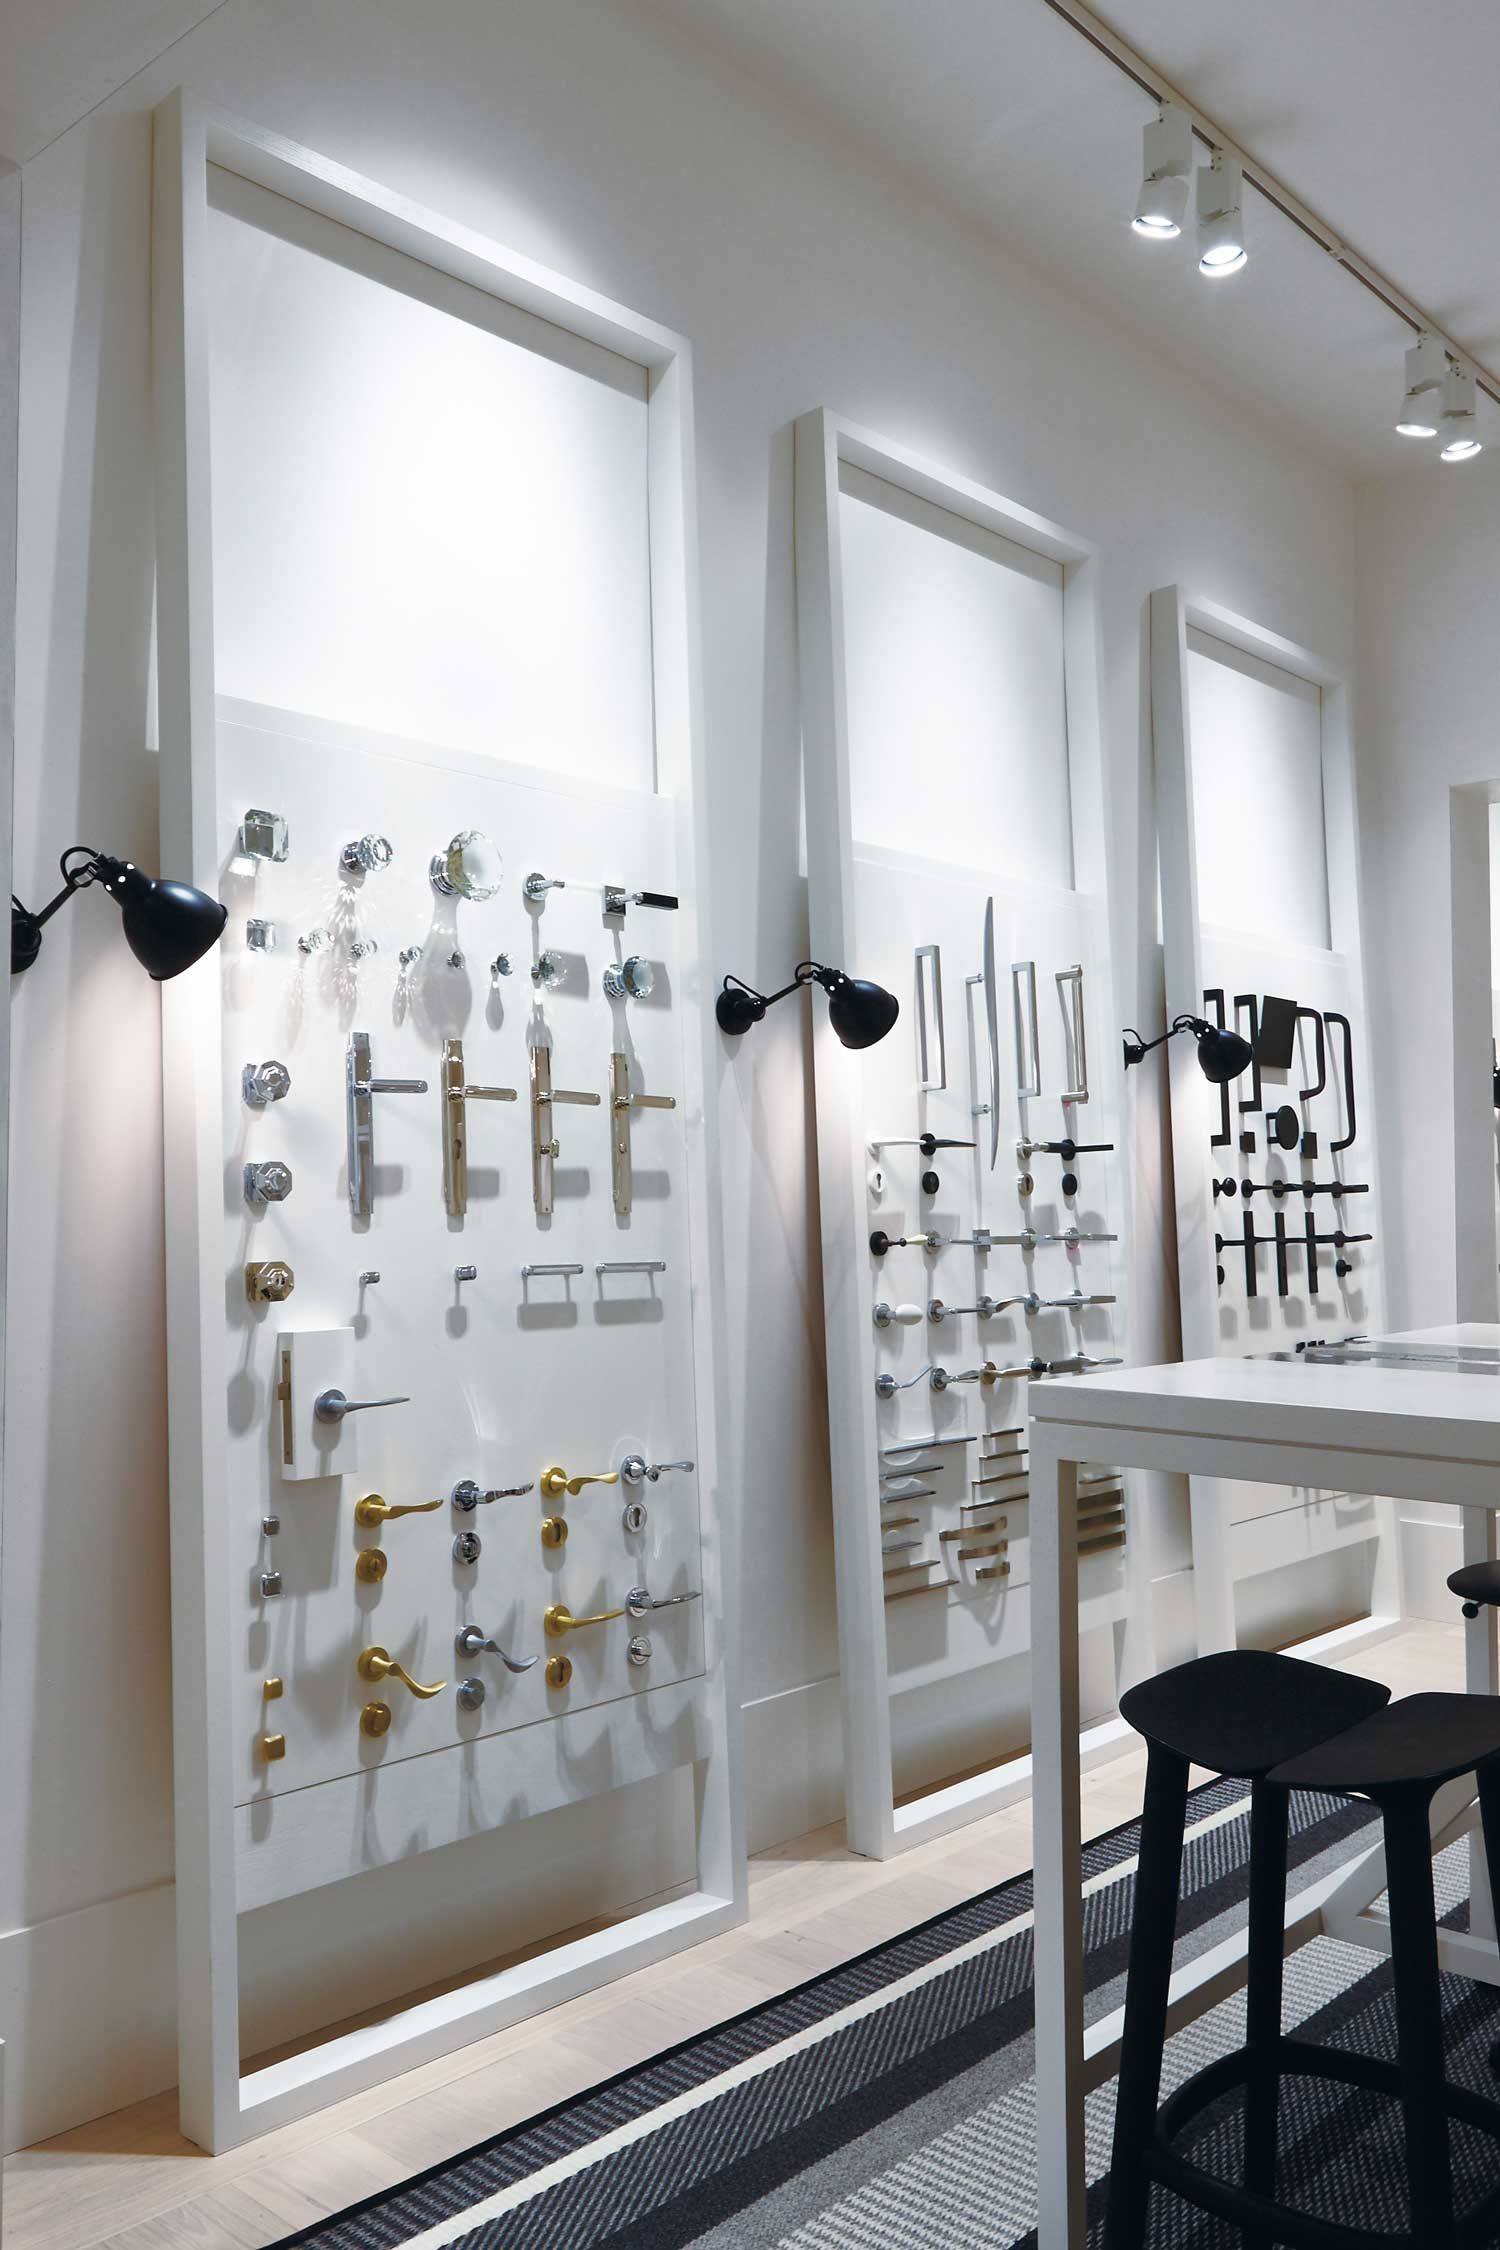 Enjoyable Pittella Melbourne Showroom By Hecker Guthrie Coffee Shop Interior Design Ideas Gentotryabchikinfo